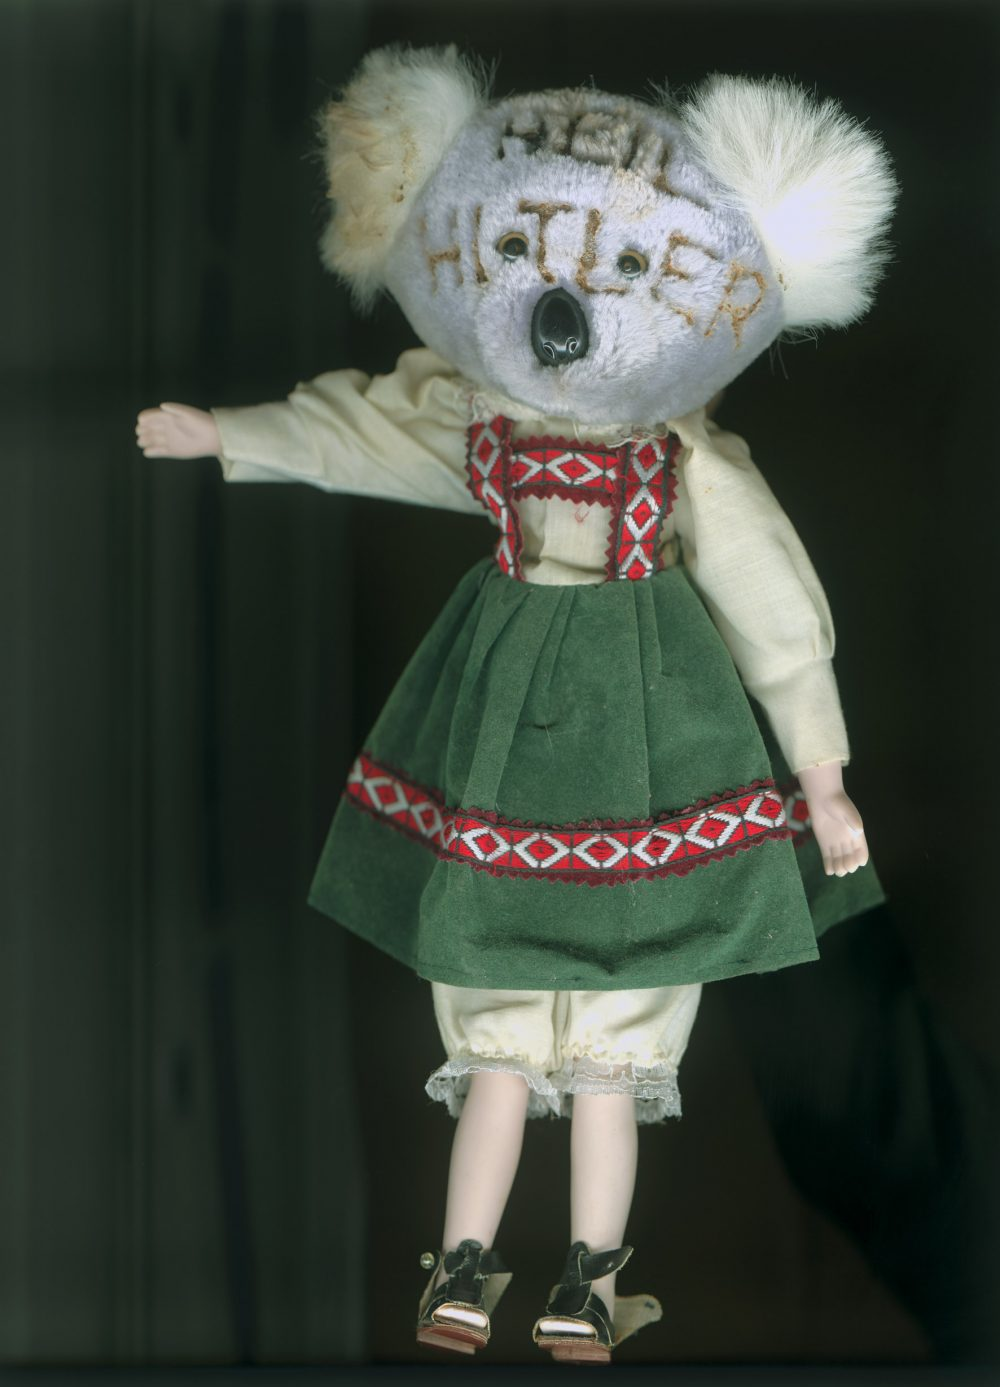 Worry Dolls: Heili (2010), Archival ink auf Fotopapier, 60 x 40 cm, Ed. 5